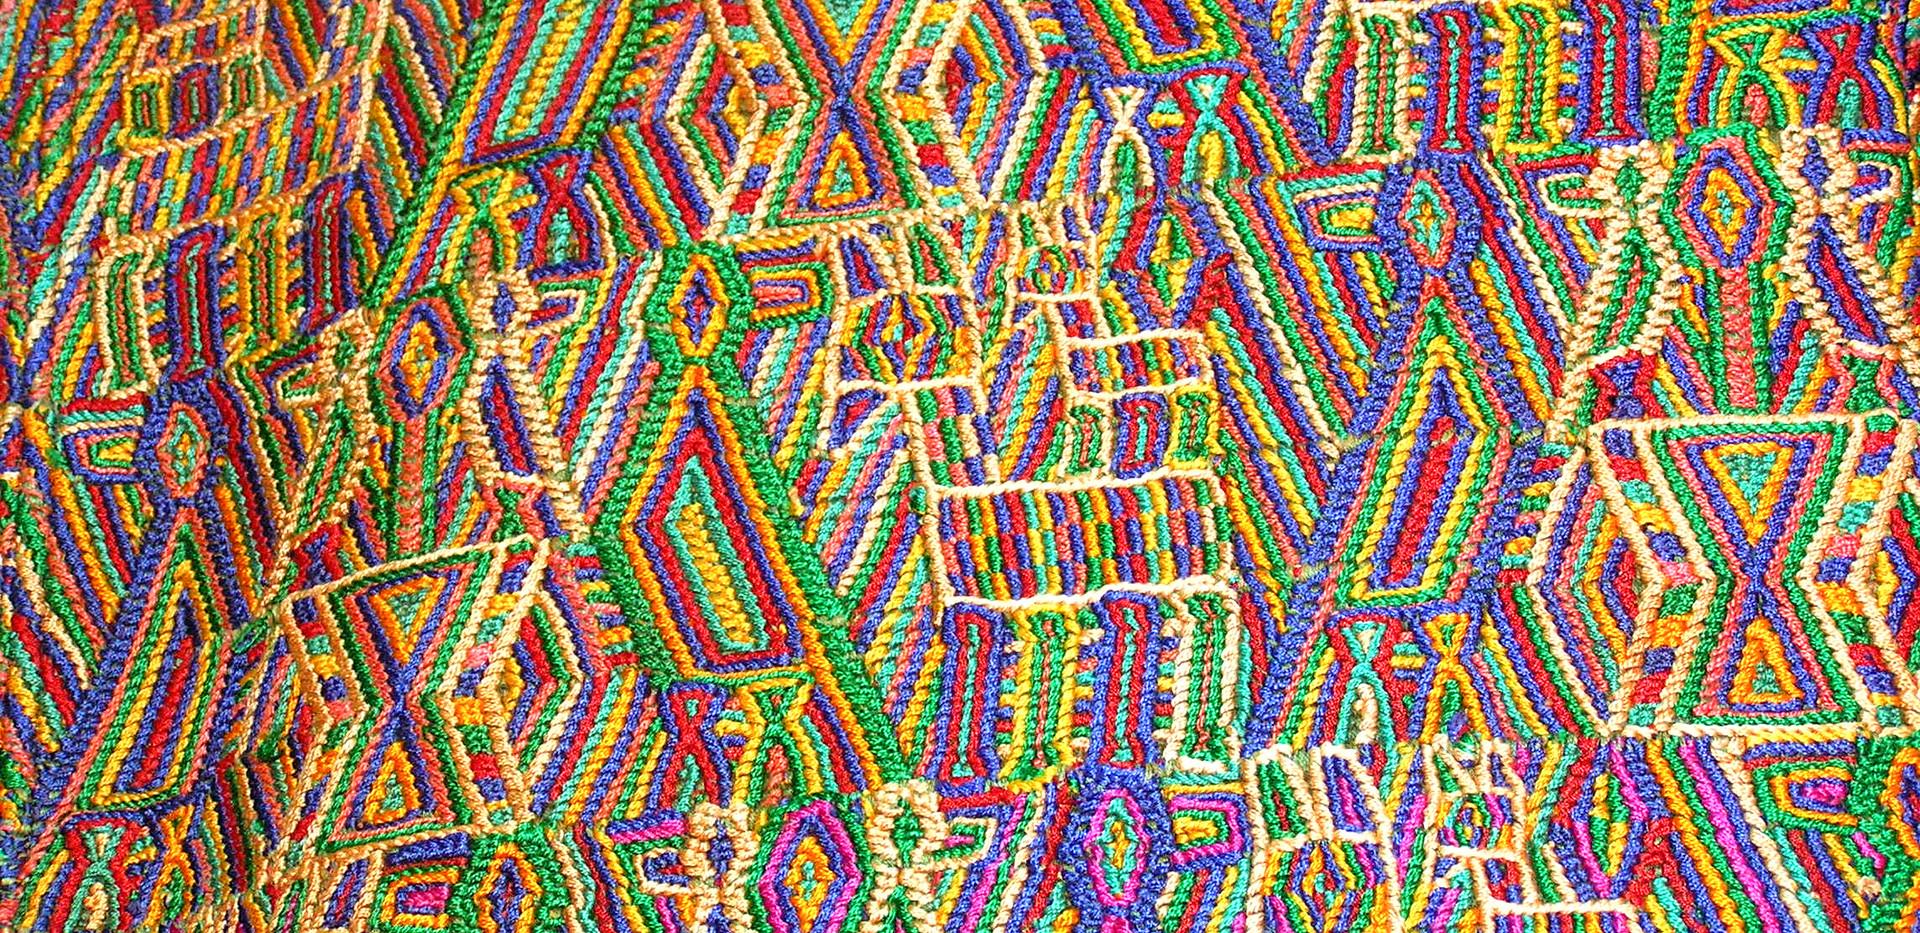 Hand Embroidery.jpg